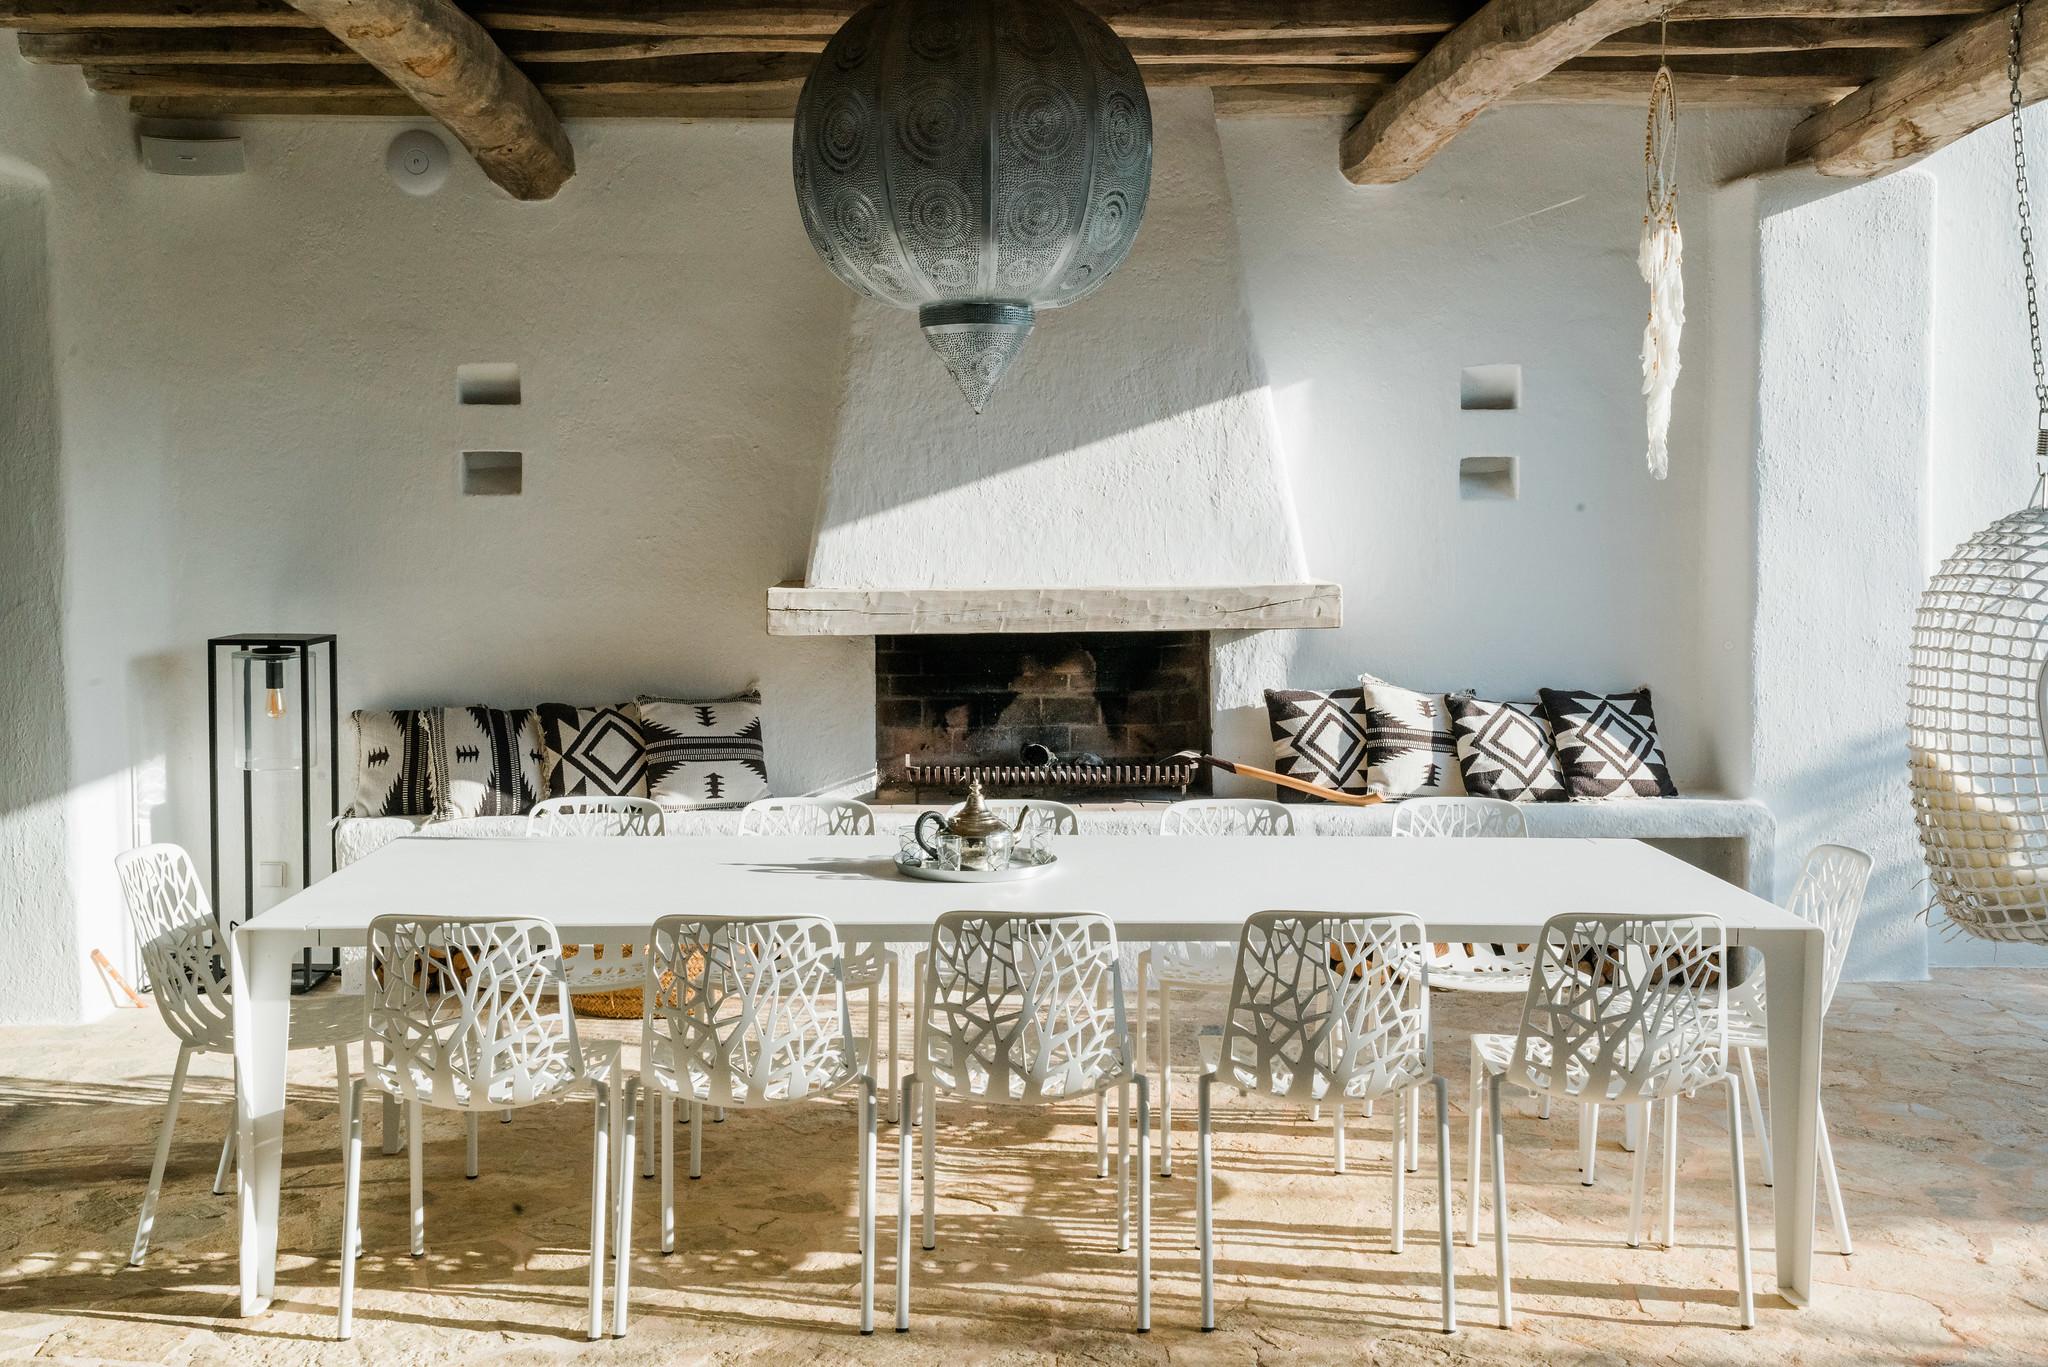 https://www.white-ibiza.com/wp-content/uploads/2020/05/white-ibiza-villas-can-terra-outside-dining.jpg